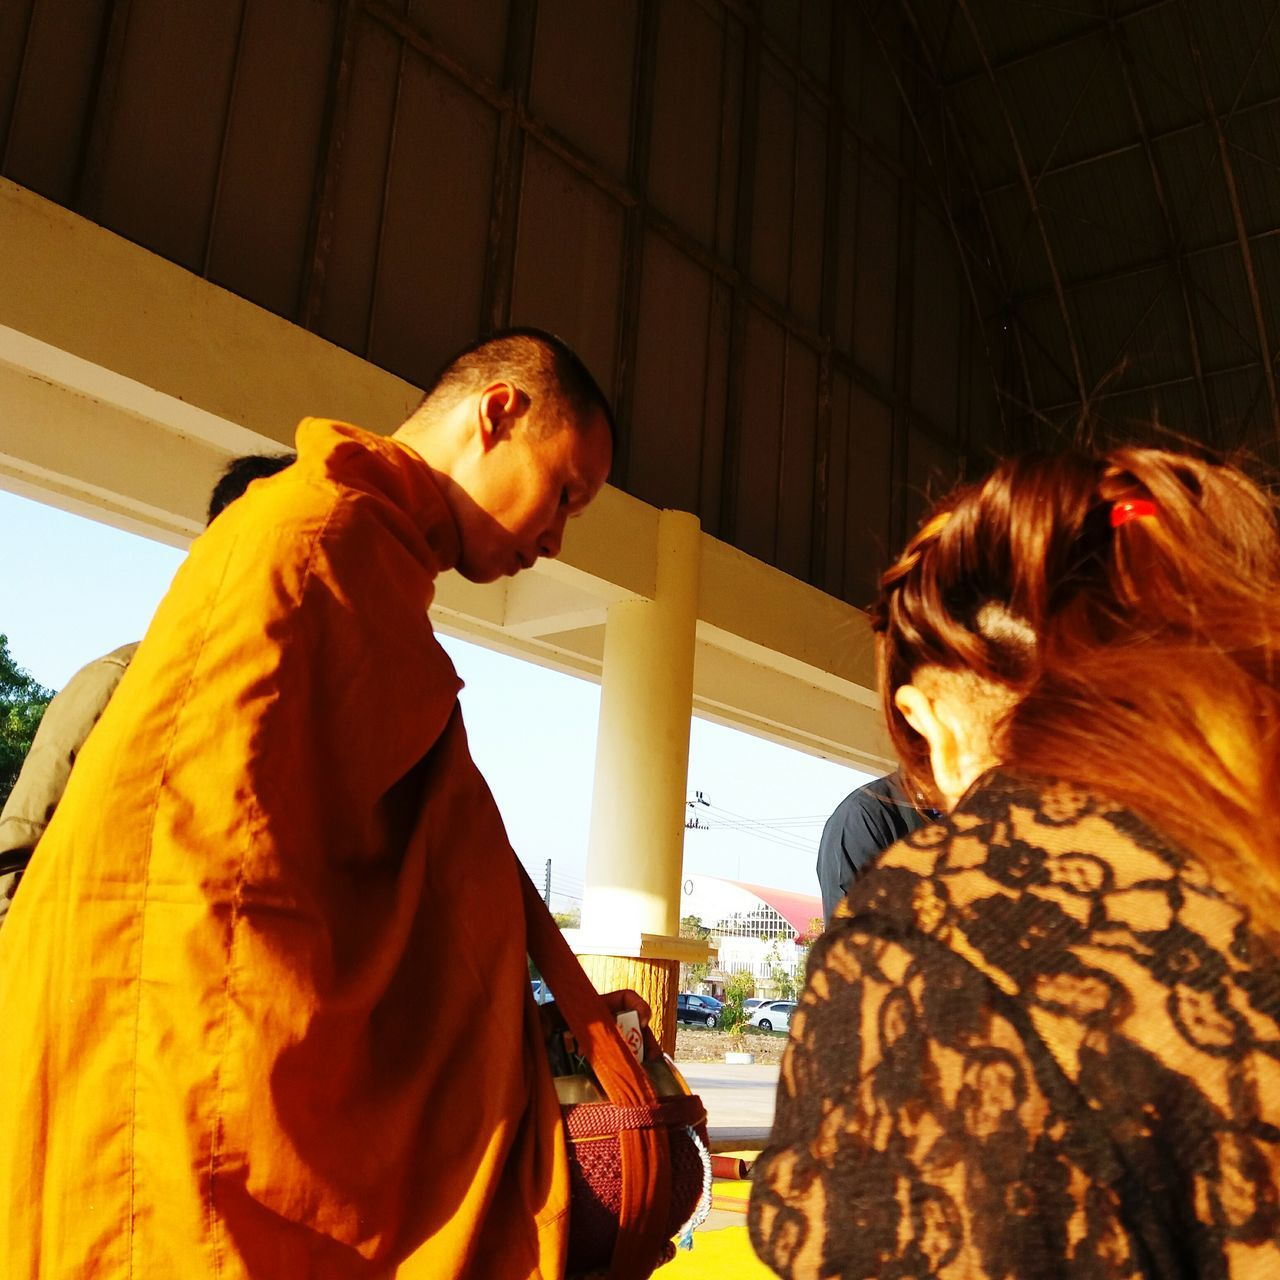 Monk  Buddism Monk Buddism Ceremony New Yesrs  People